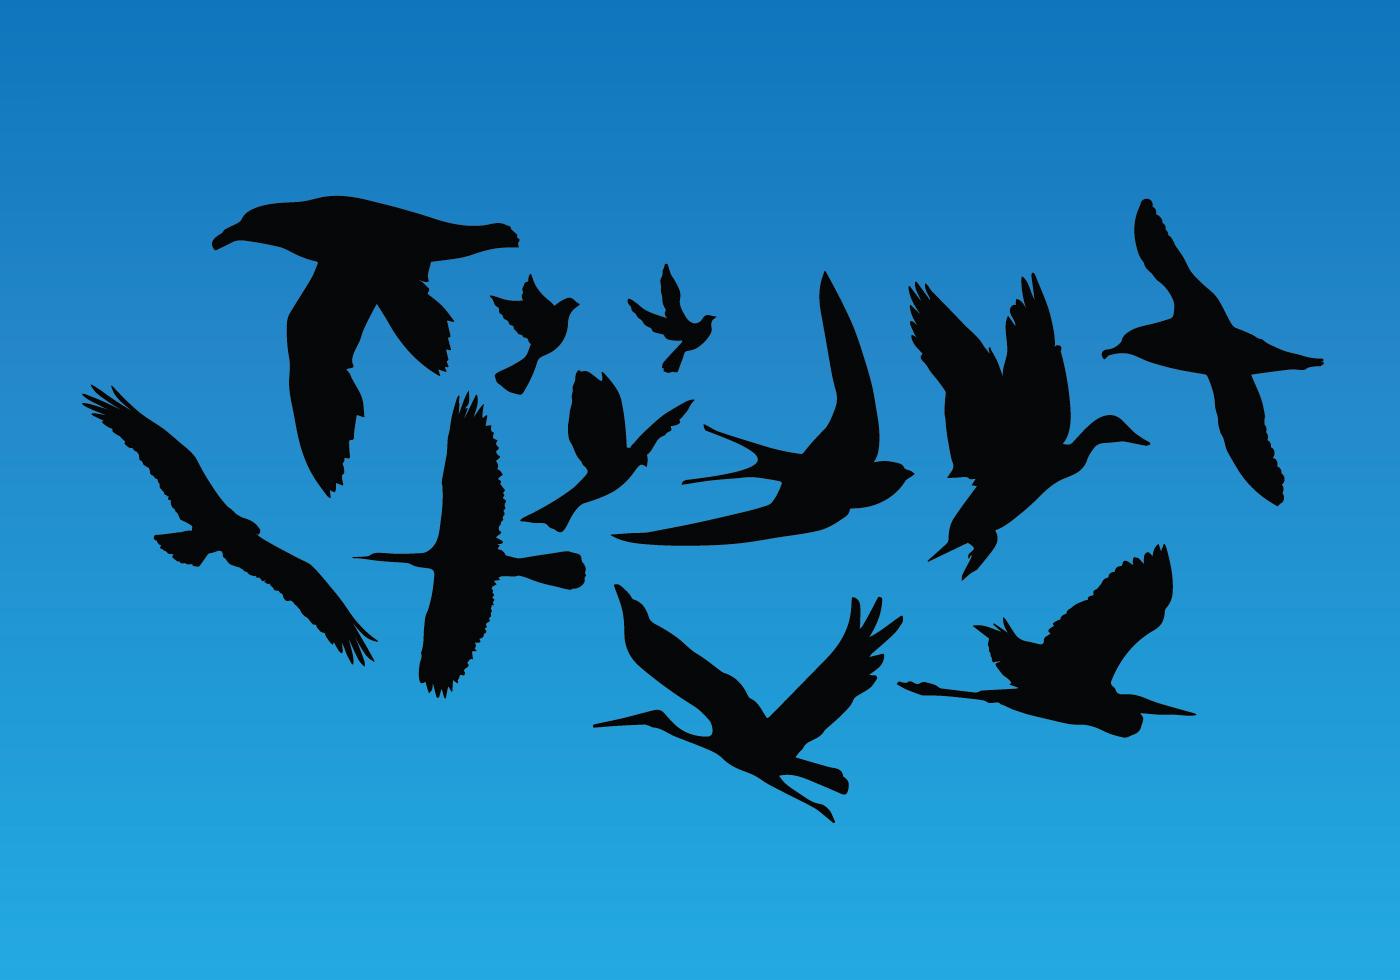 Flying Birds Vector Pack - Download Free Vector Art, Stock Graphics & Images